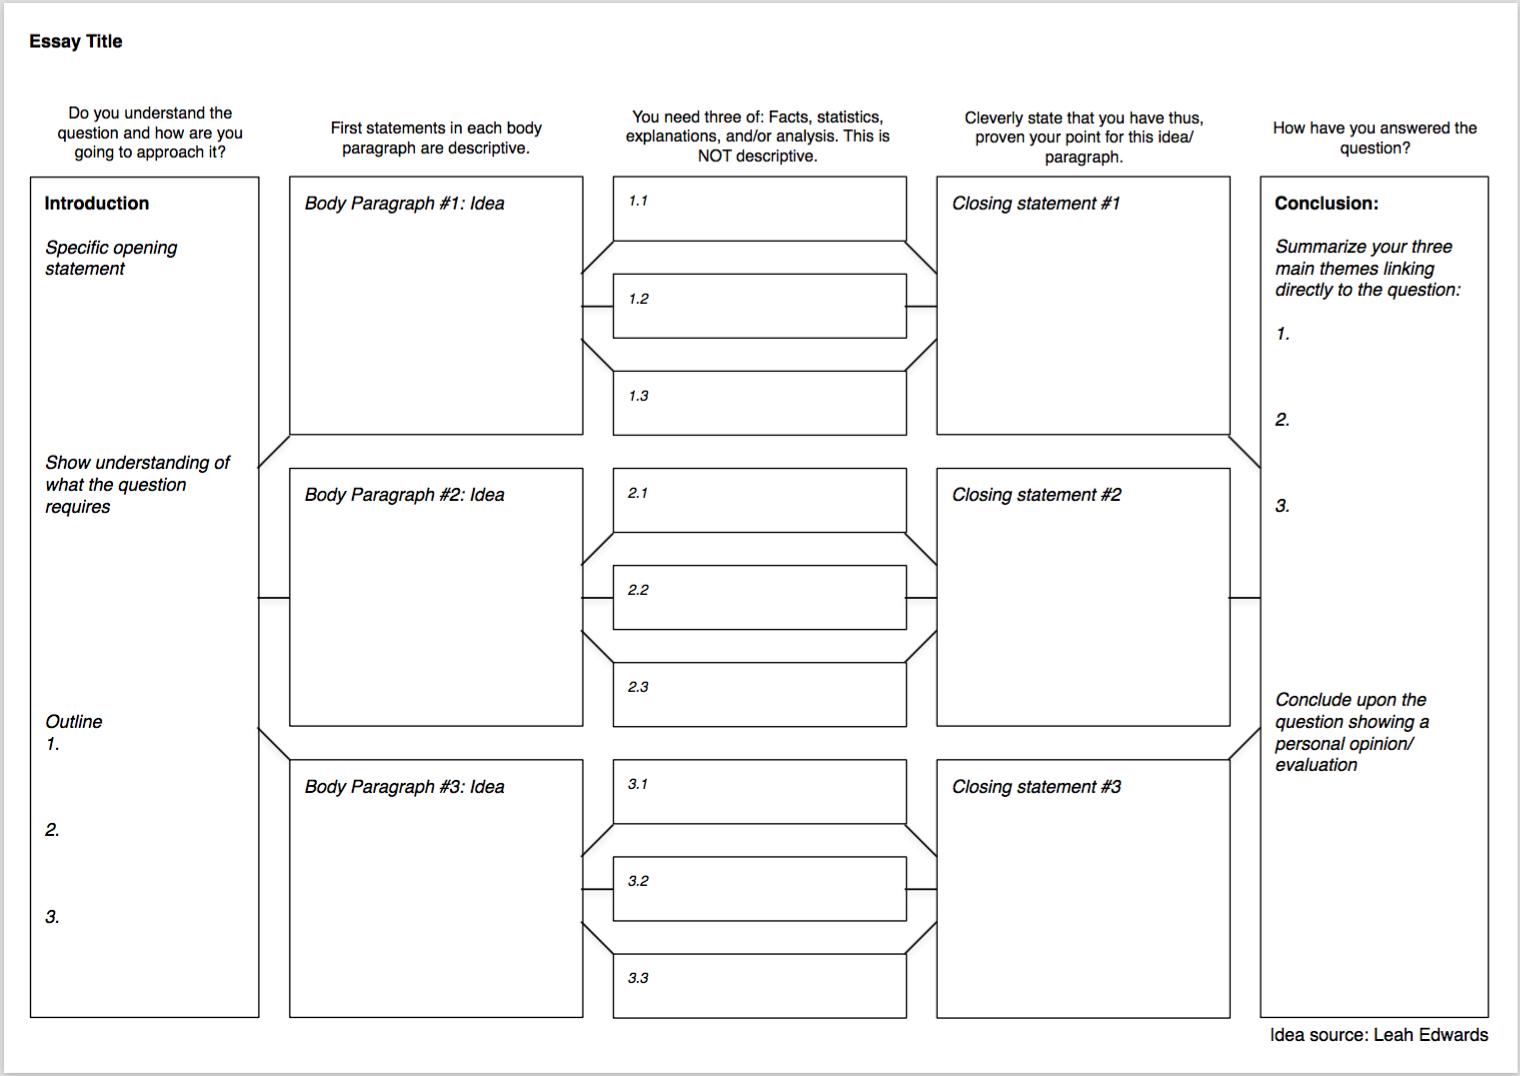 Essay Planner Screenshot.png